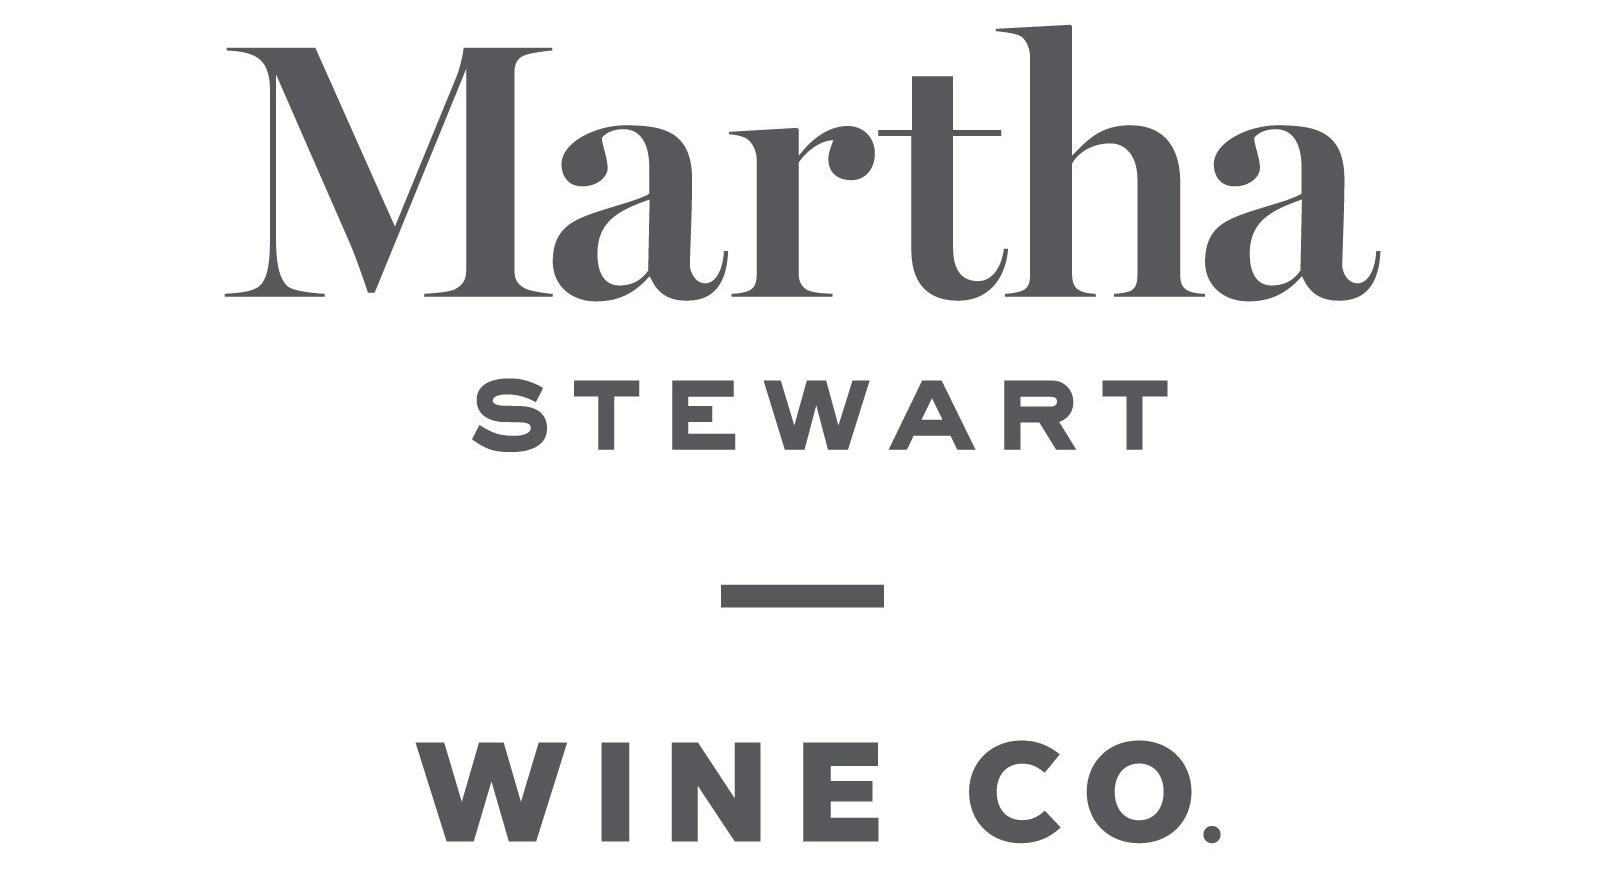 Valentine's Day Deal! Enjoy 30% OFF with code VDAY30 at Martha Stewart Wine Co!